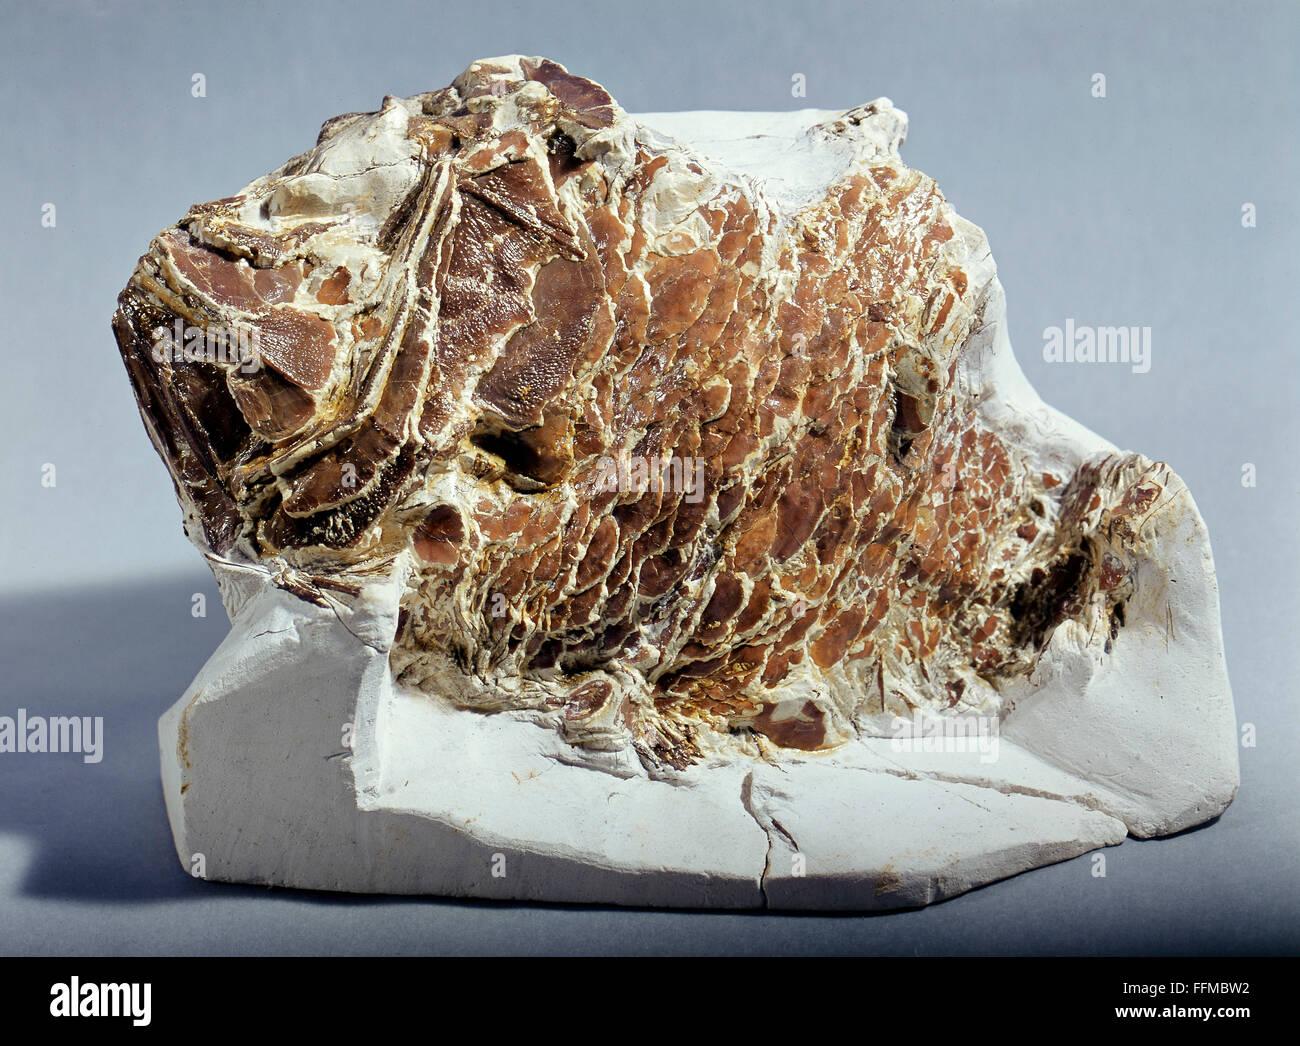 La prehistoria, fósil, peces de coral en un bloque de tiza cretácea, Dover, Inglaterra, colección Imagen De Stock